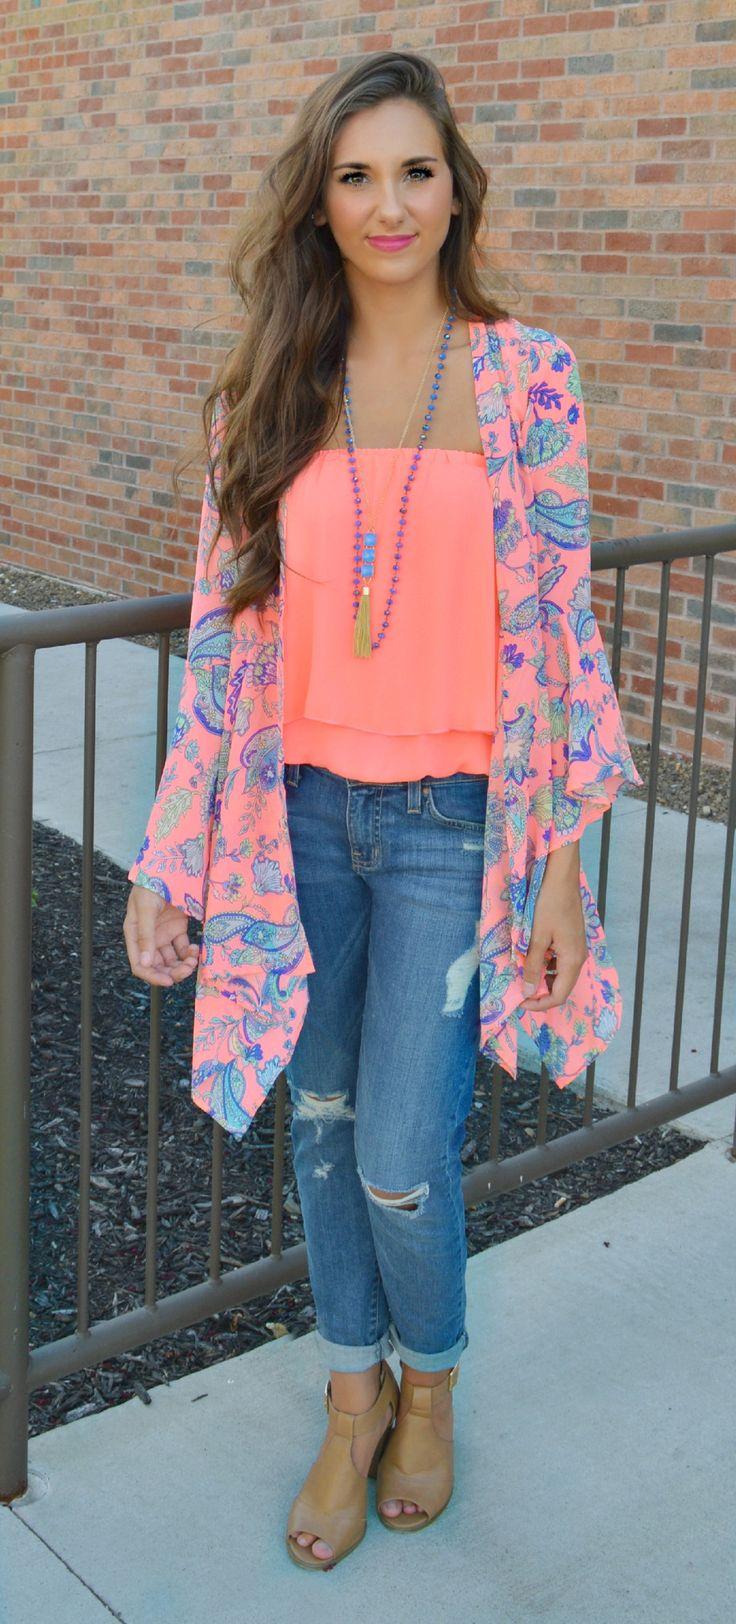 Kimono Cardigan Outfits - Sweater Vest